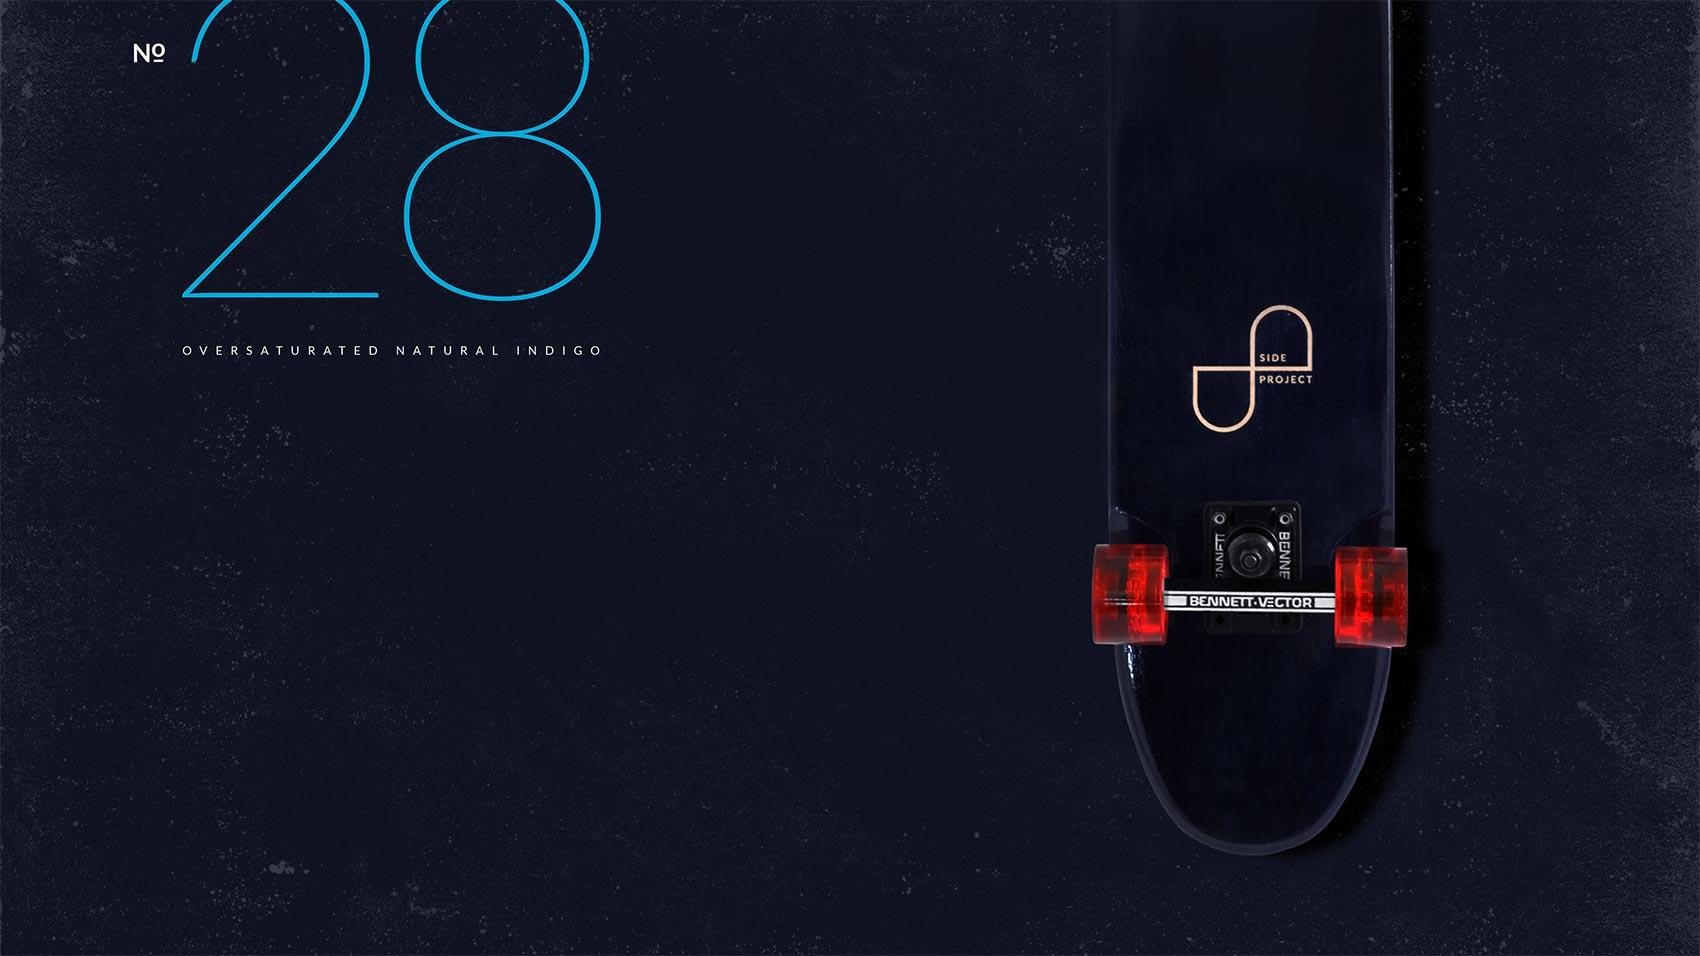 Indigo-Lookbook-4.jpg